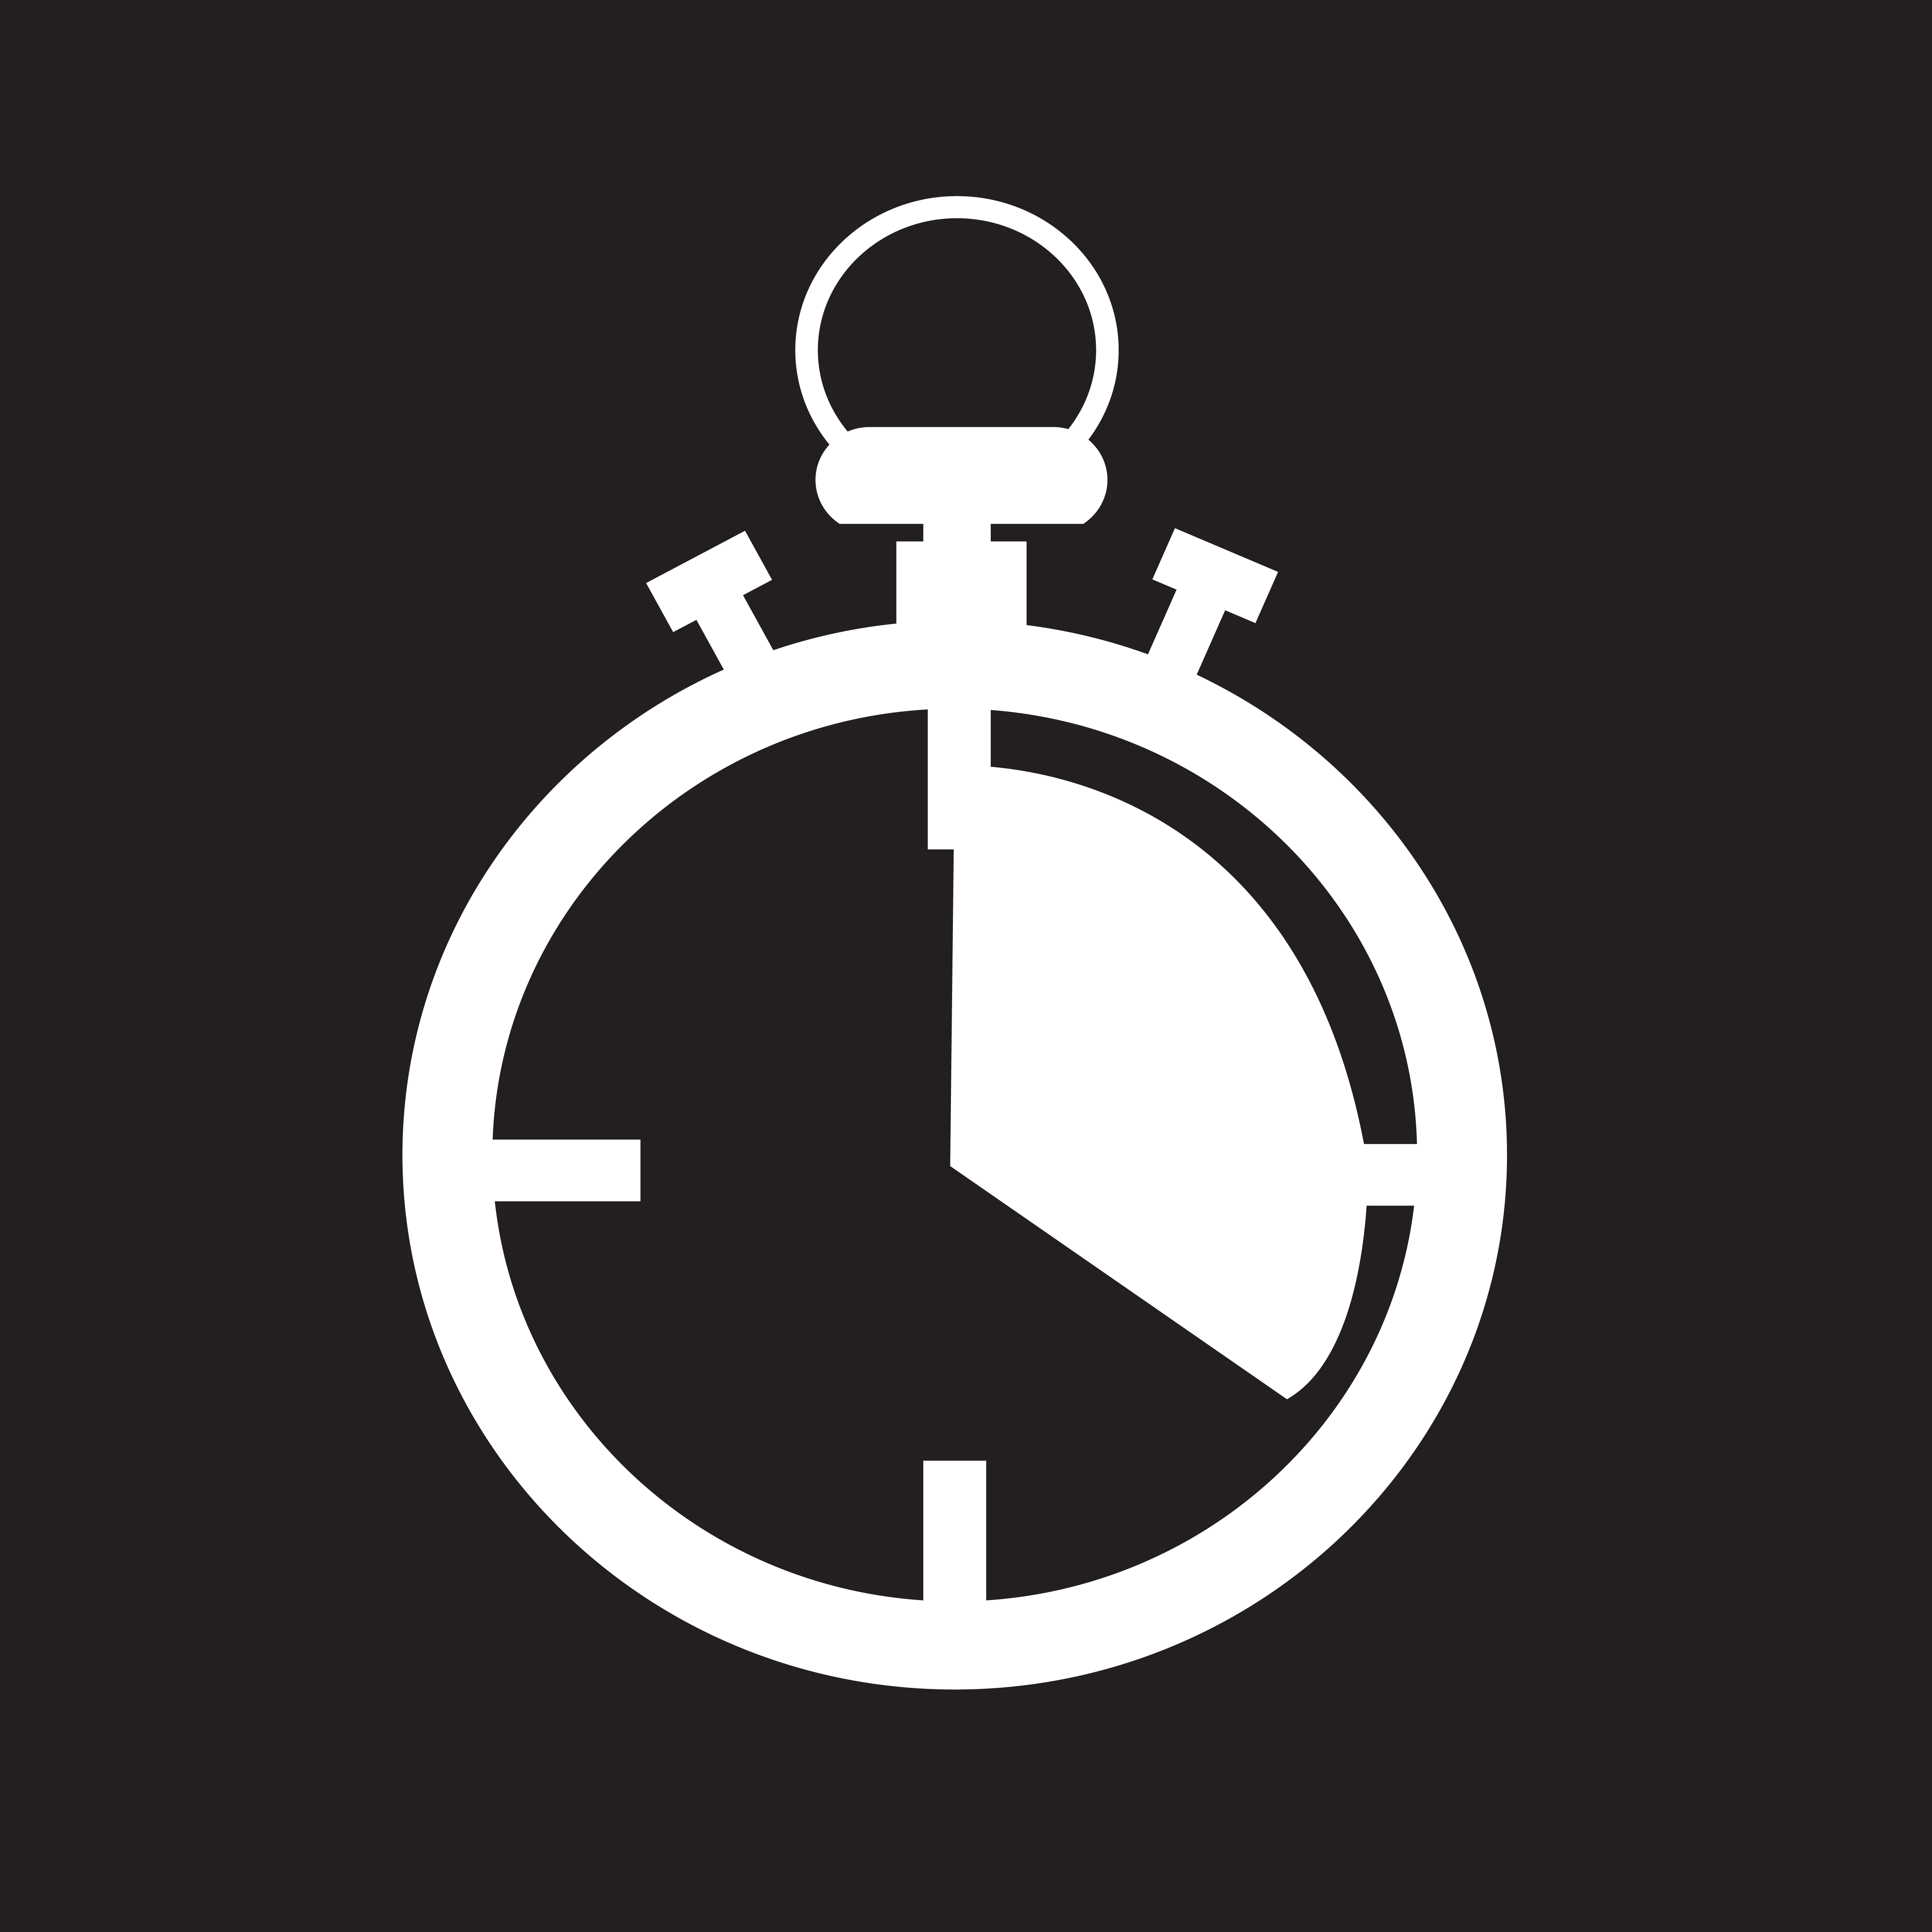 signe de symbole ic u00f4ne chronom u00e8tre